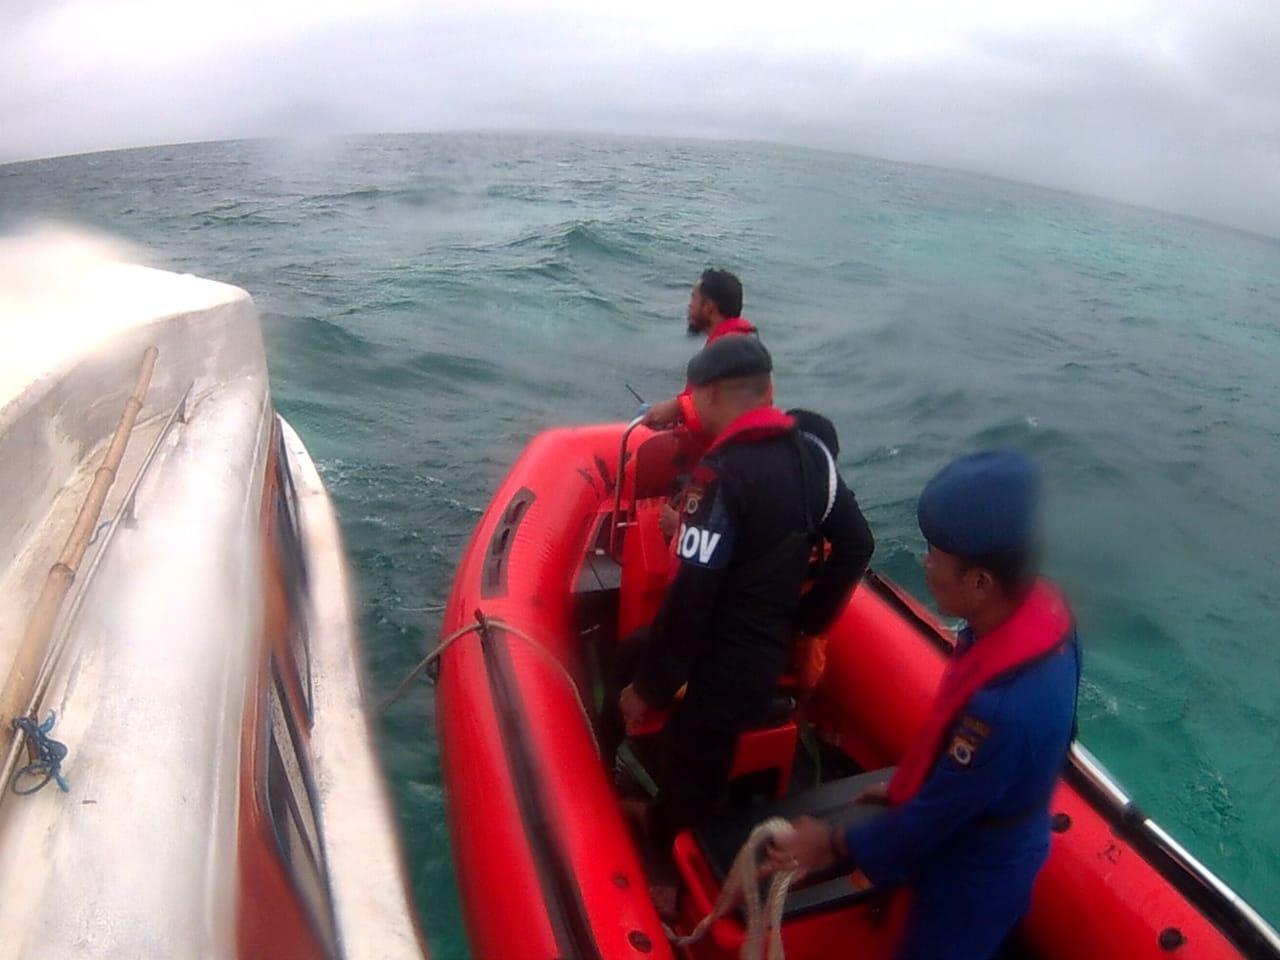 Penumpang 'Long Boat' Yang Mati Mesin Berhasil Dievakuasi Tim SAR Gabungan